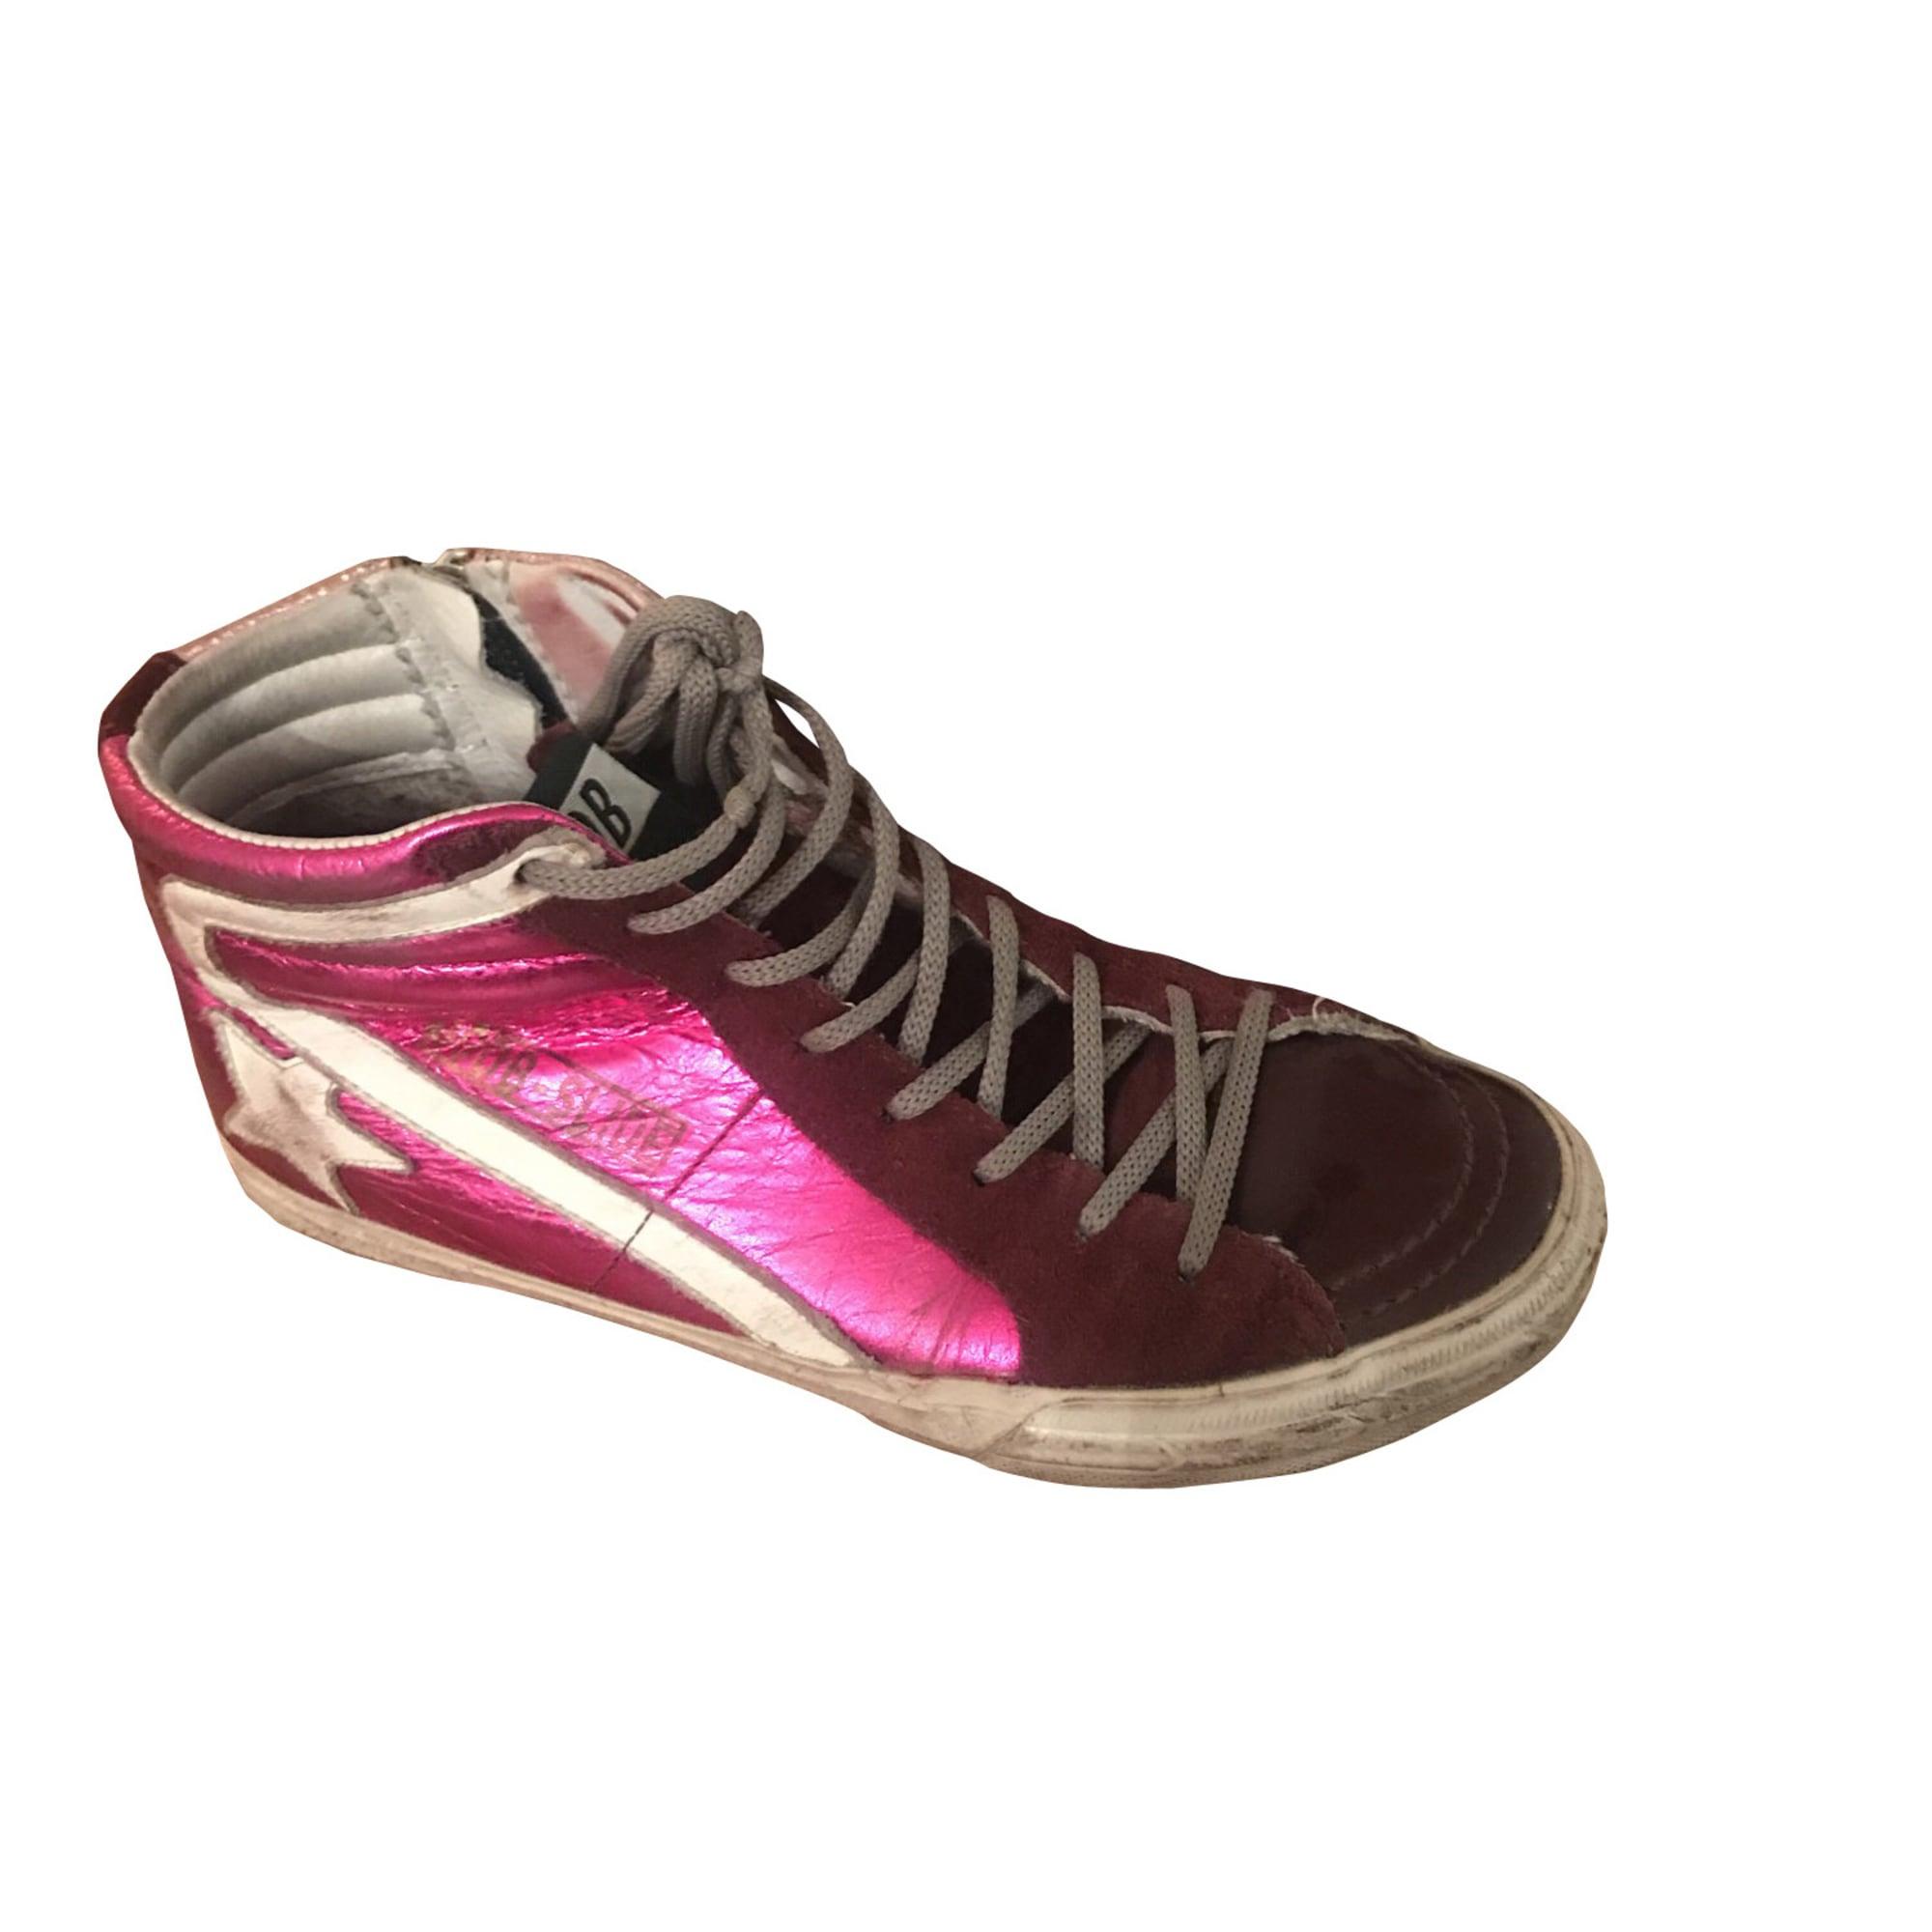 Sneakers GOLDEN GOOSE Pink, fuchsia, light pink